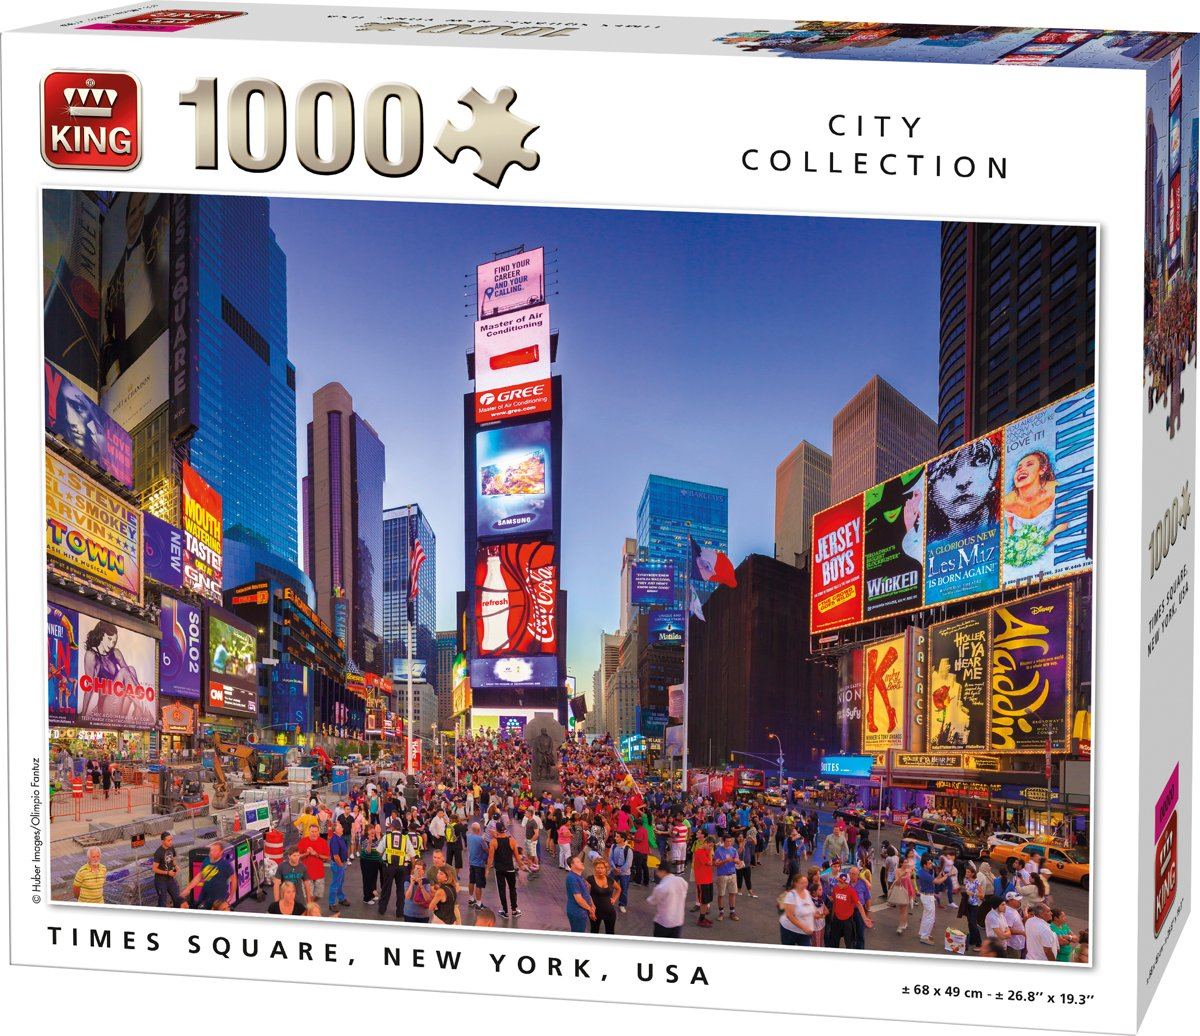 King Puzzel 1000 Stukjes (68 x 49 cm) - Times Square New York - Legpuzzel Steden kopen